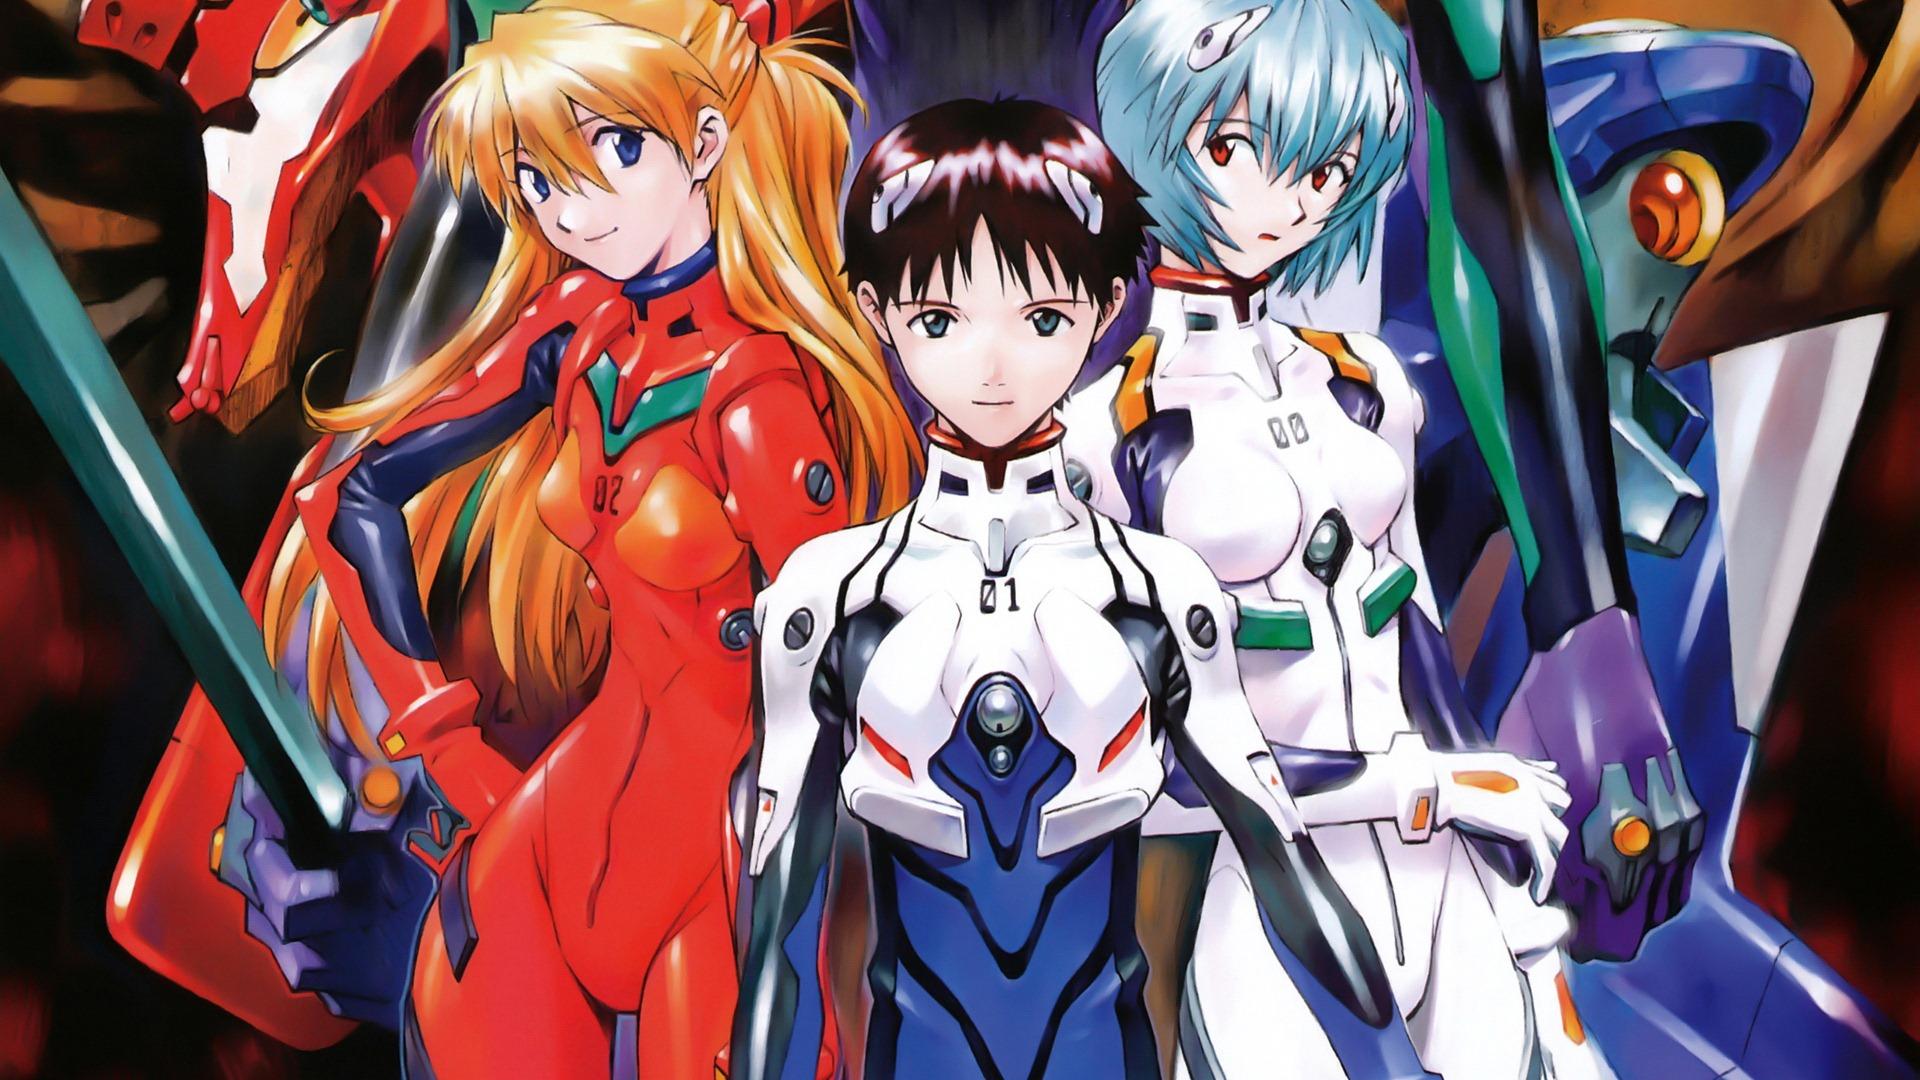 Top 20 Most Psychological Anime haruhichan.com Neon Genesis Evangelion